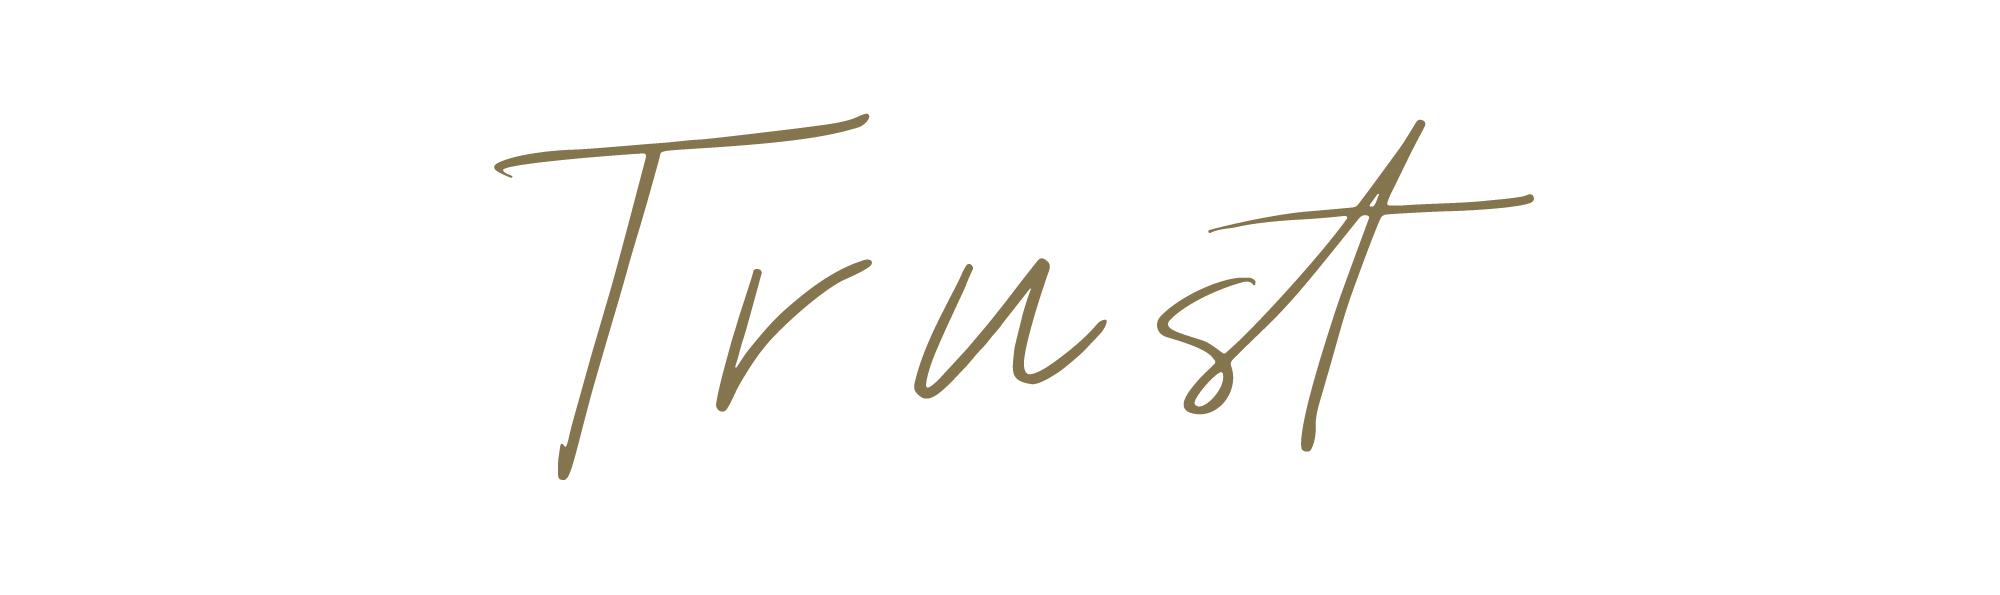 TRUSTBANNER.jpg